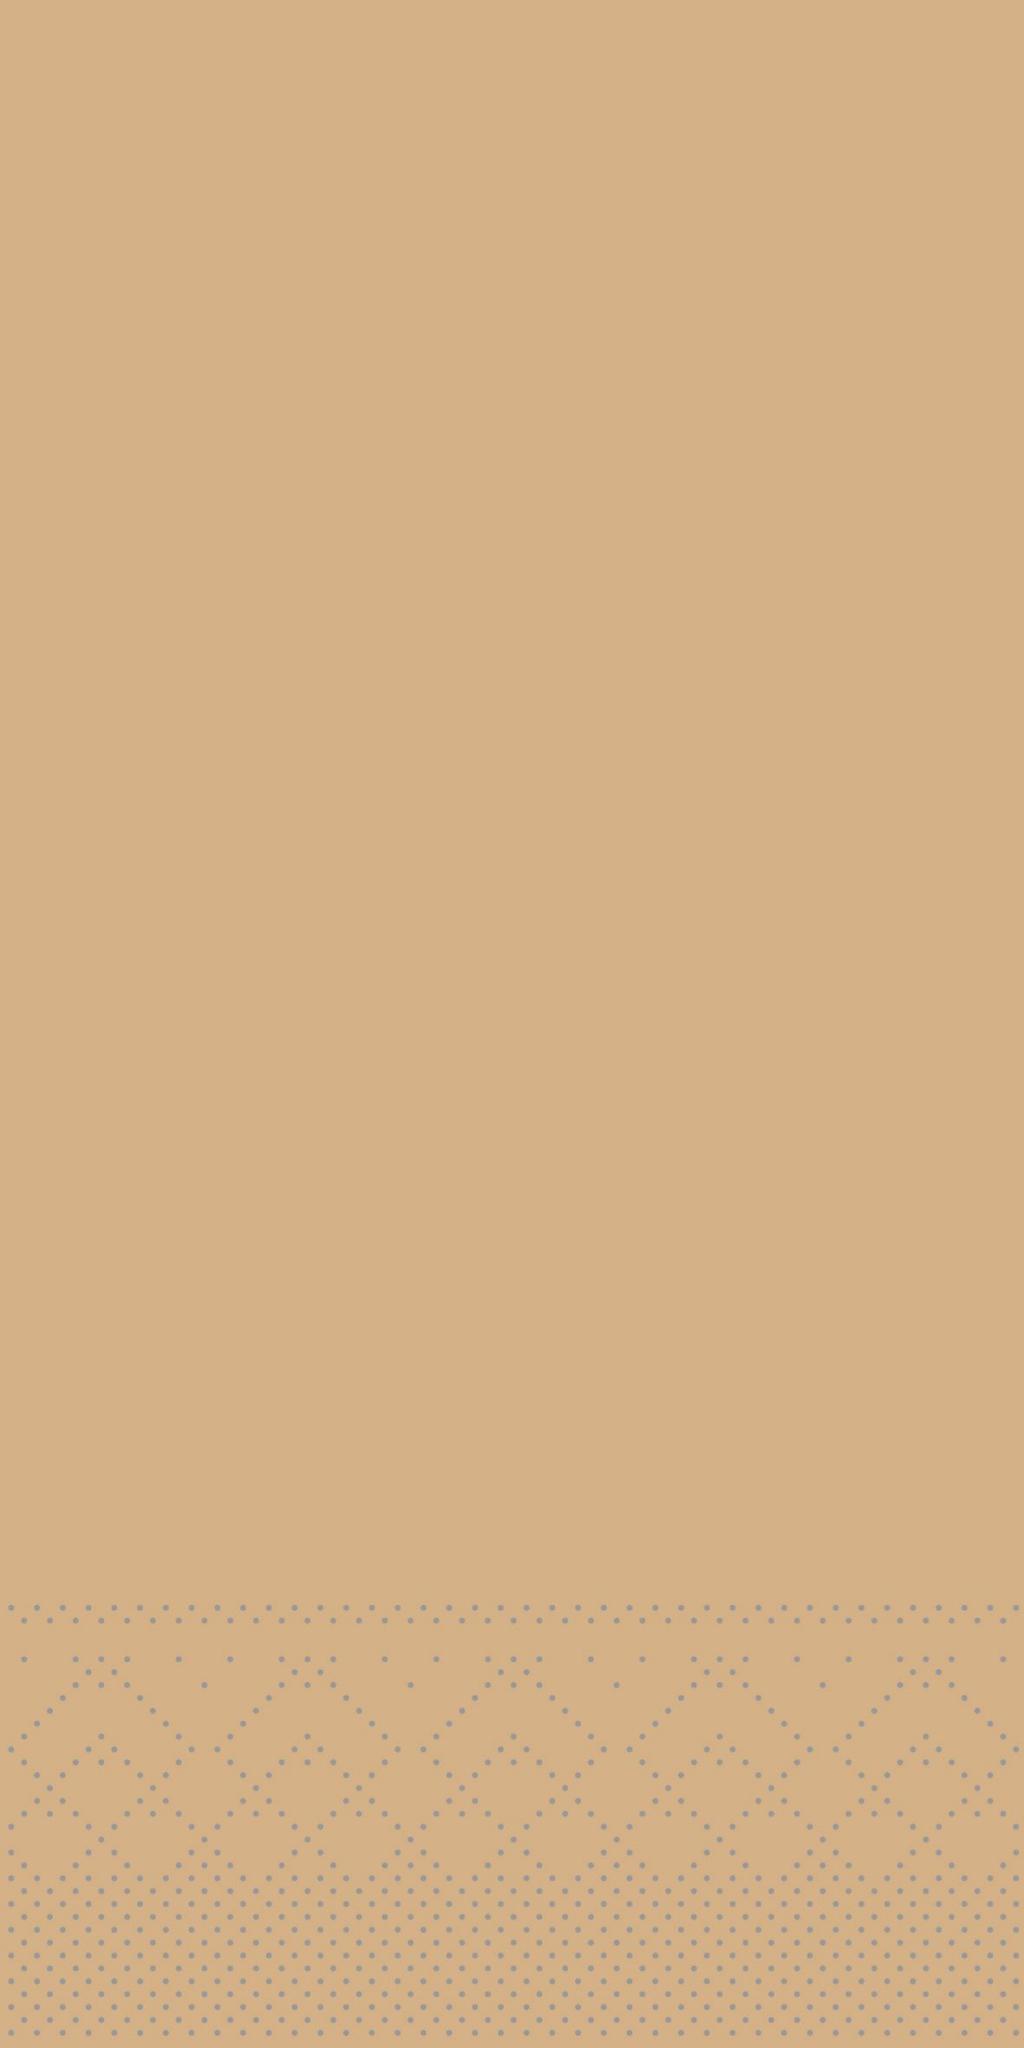 Tissue servetten 33x33 cm - BASIC  SAND  33x33 cm 1/8-Falz